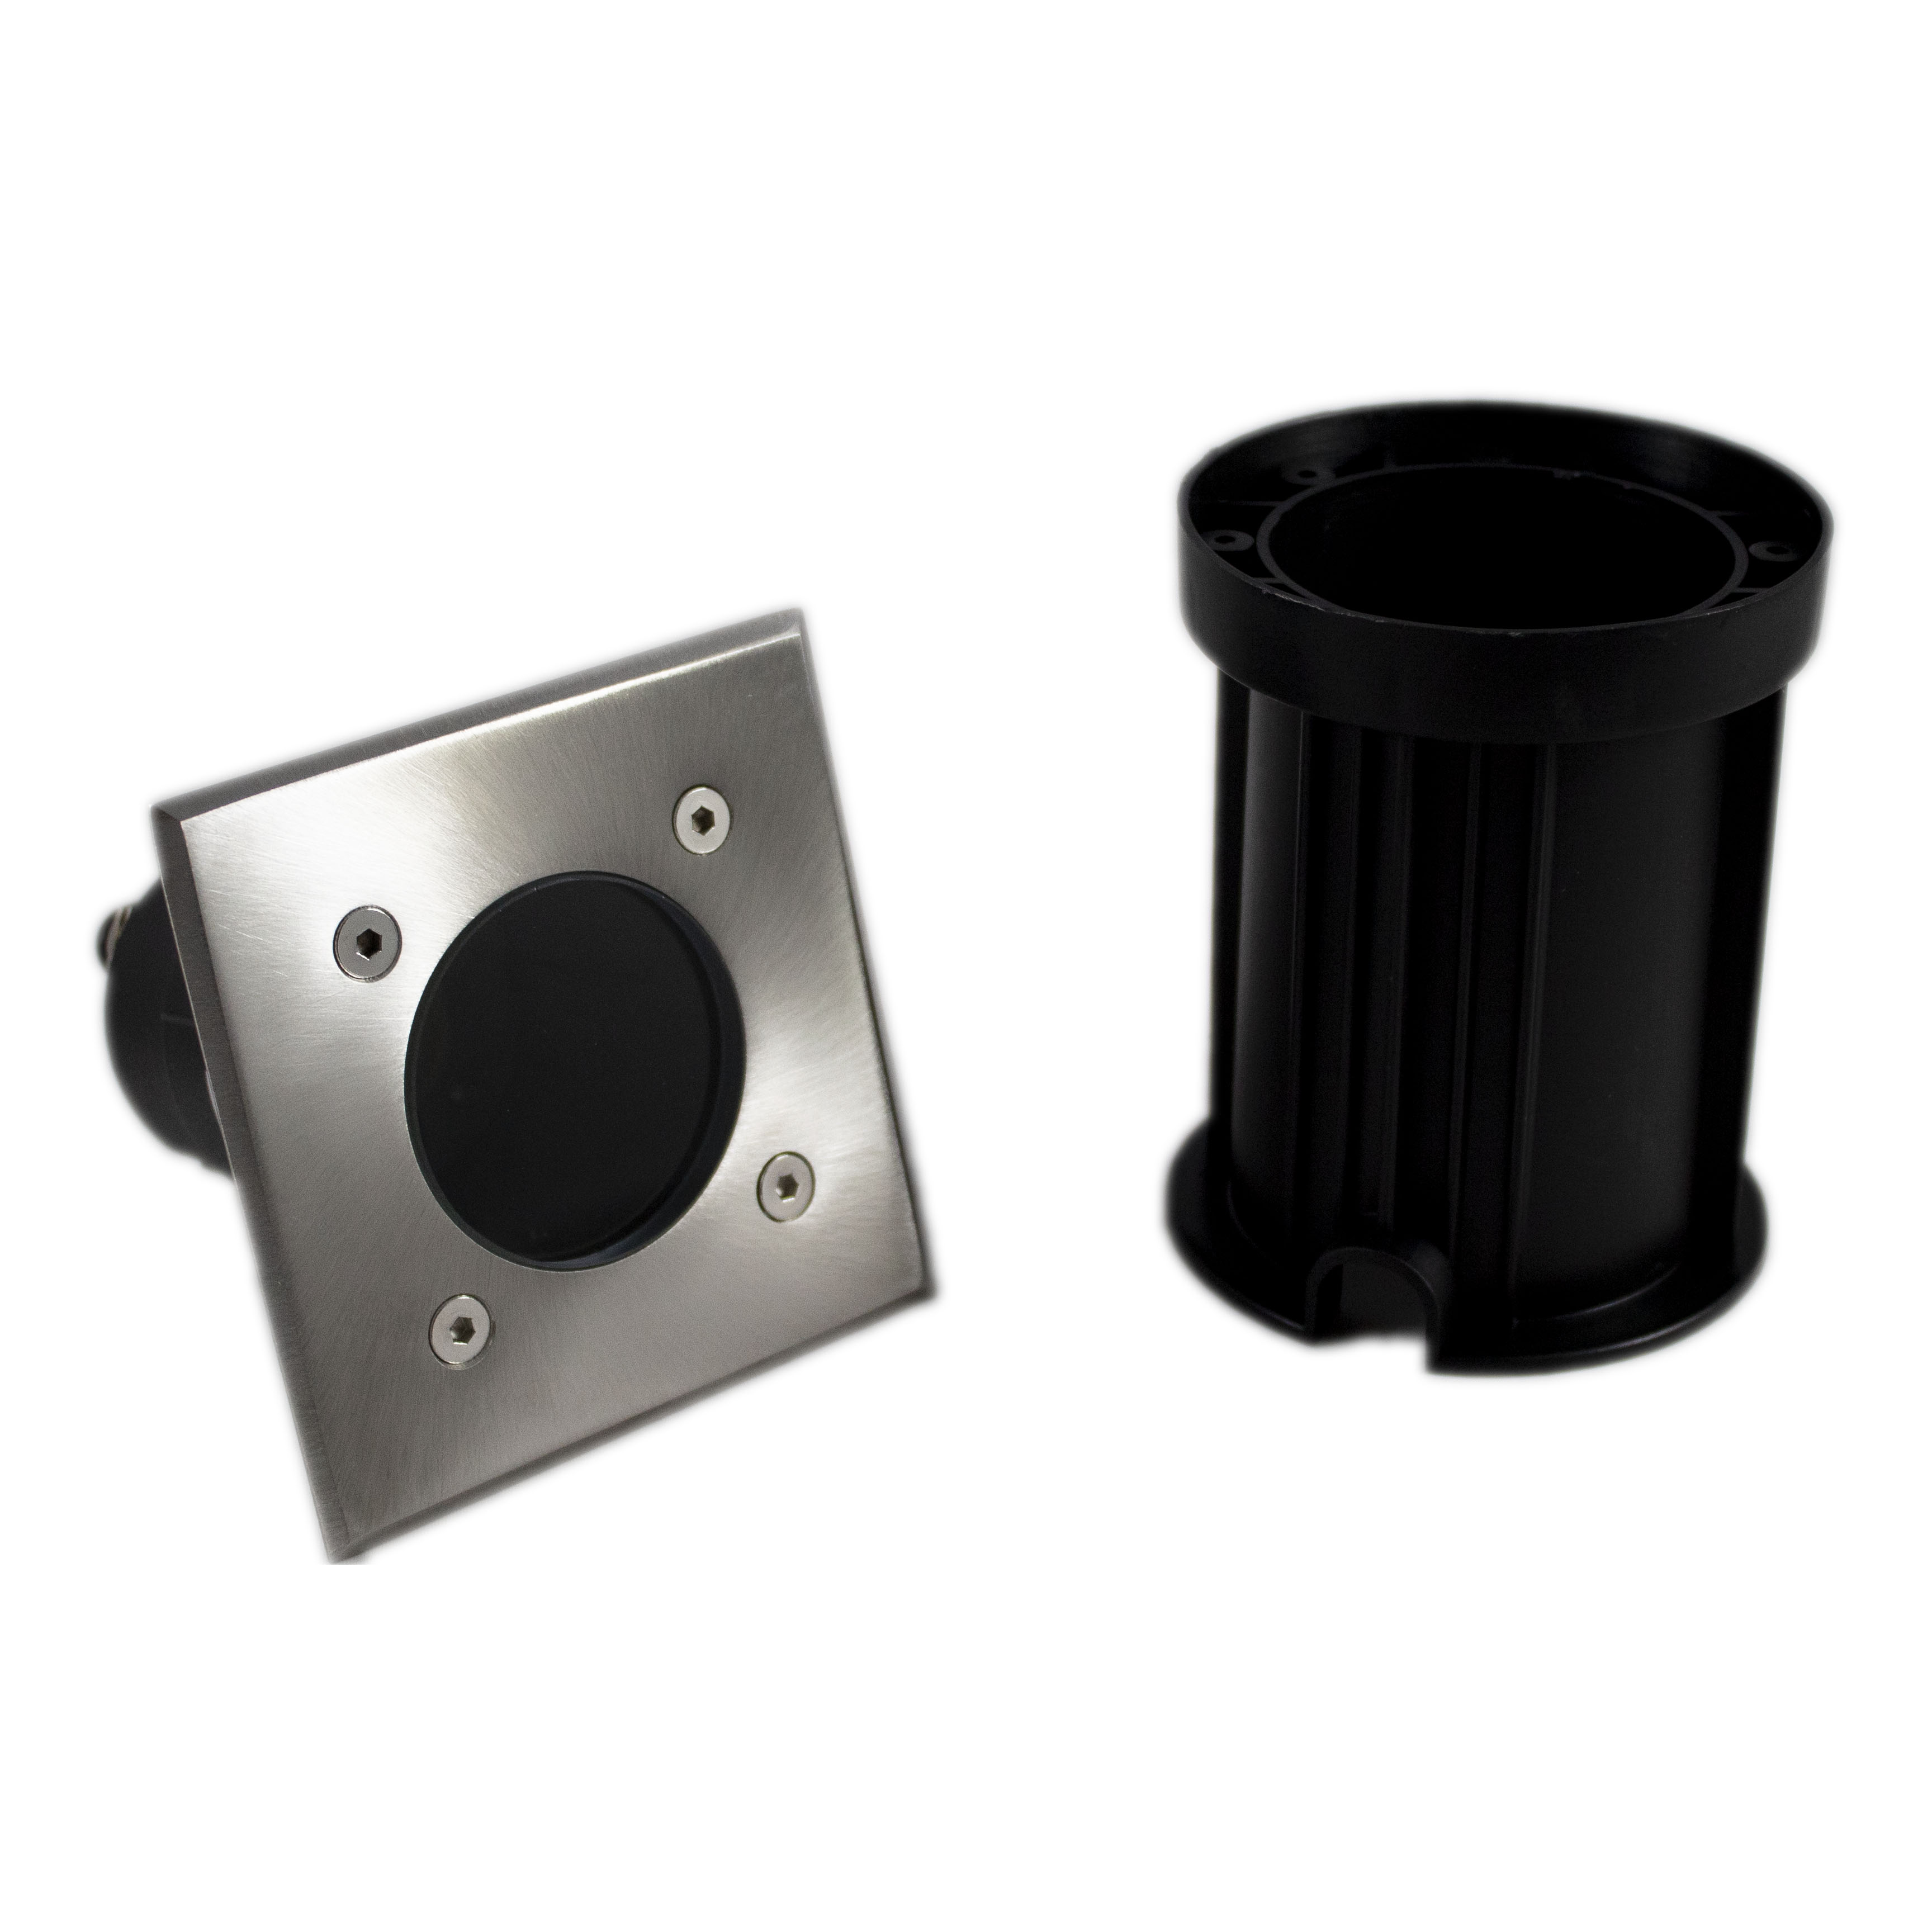 Led grondspot vierkant IP67 1 keer GU10 fitting - onderdelen grondspot